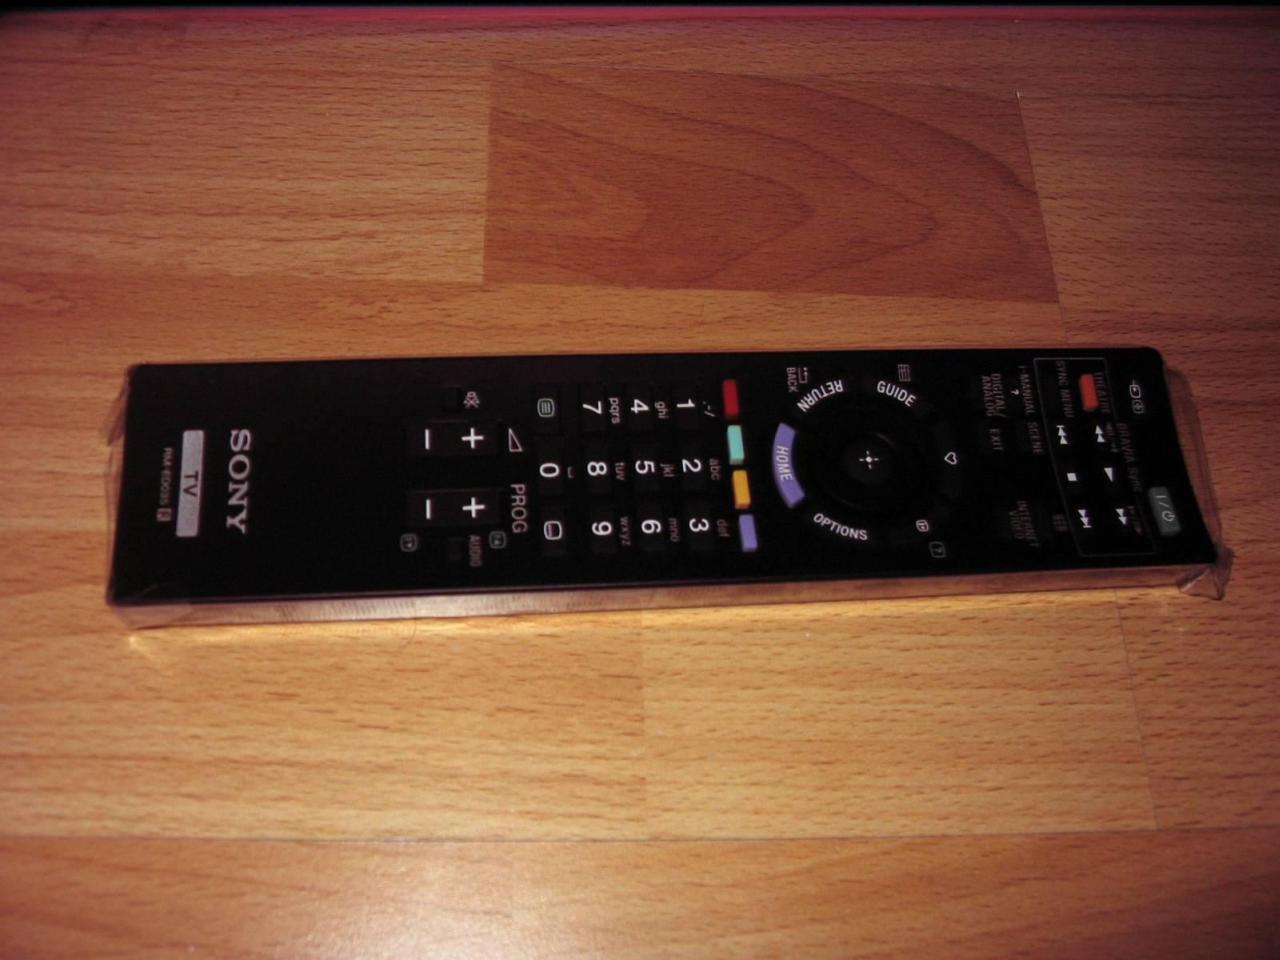 Led Fernseher Verkleidung : Review 40 TV  Sony KDL40EX605  Mein kleines Review  ComputerBas